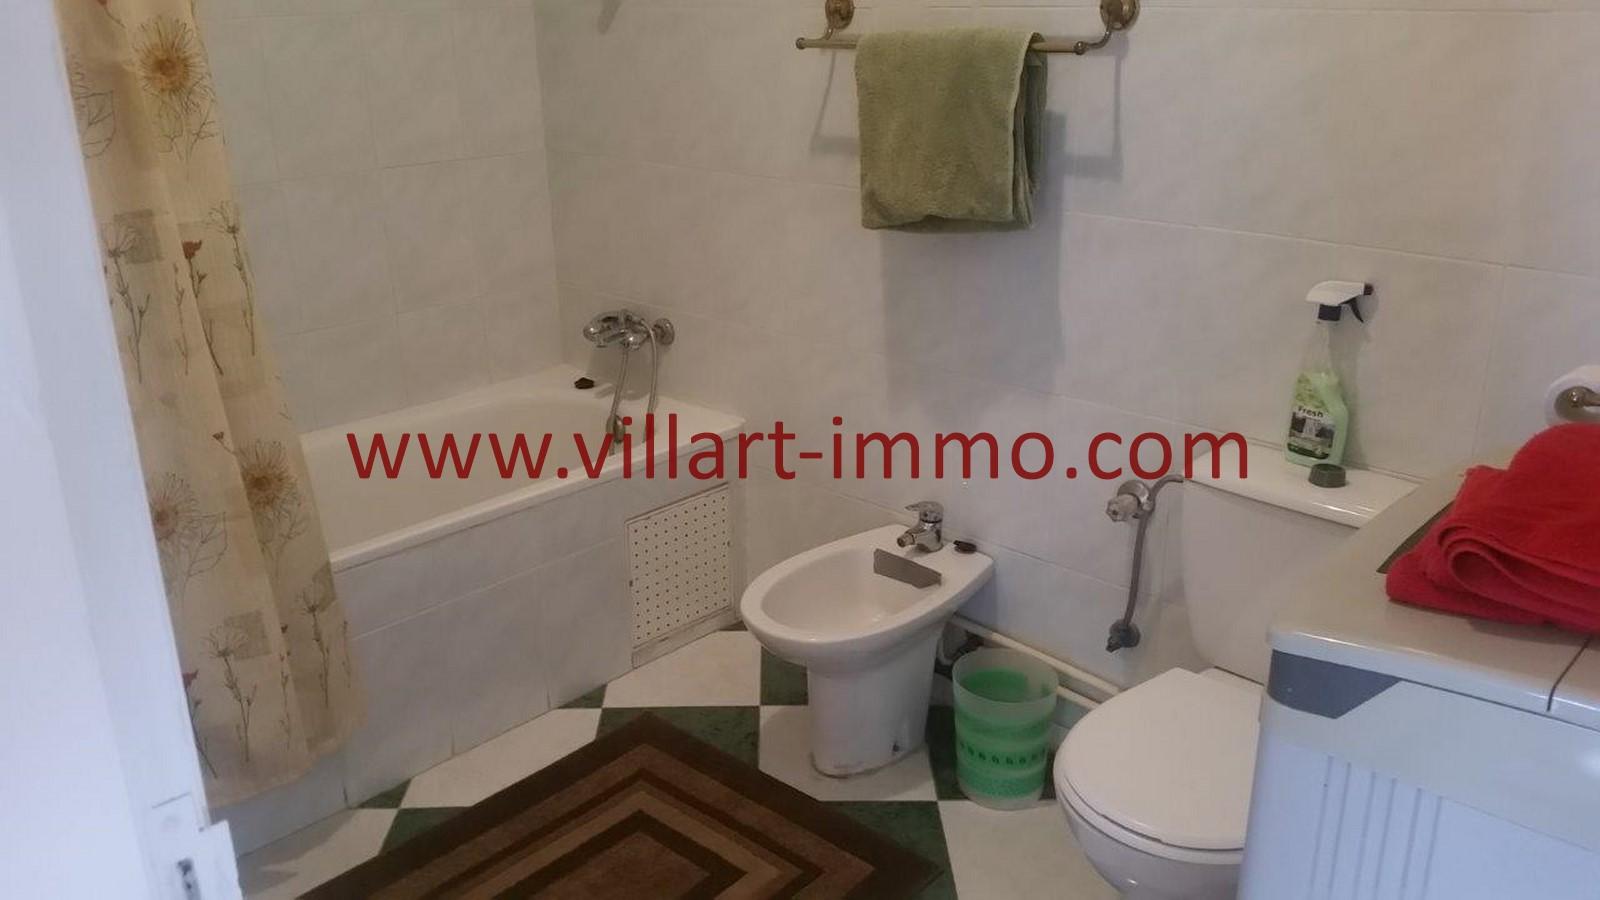 6-Location-Appartement-Tanger-Centre ville-Salle de bain-L984-Villart immo